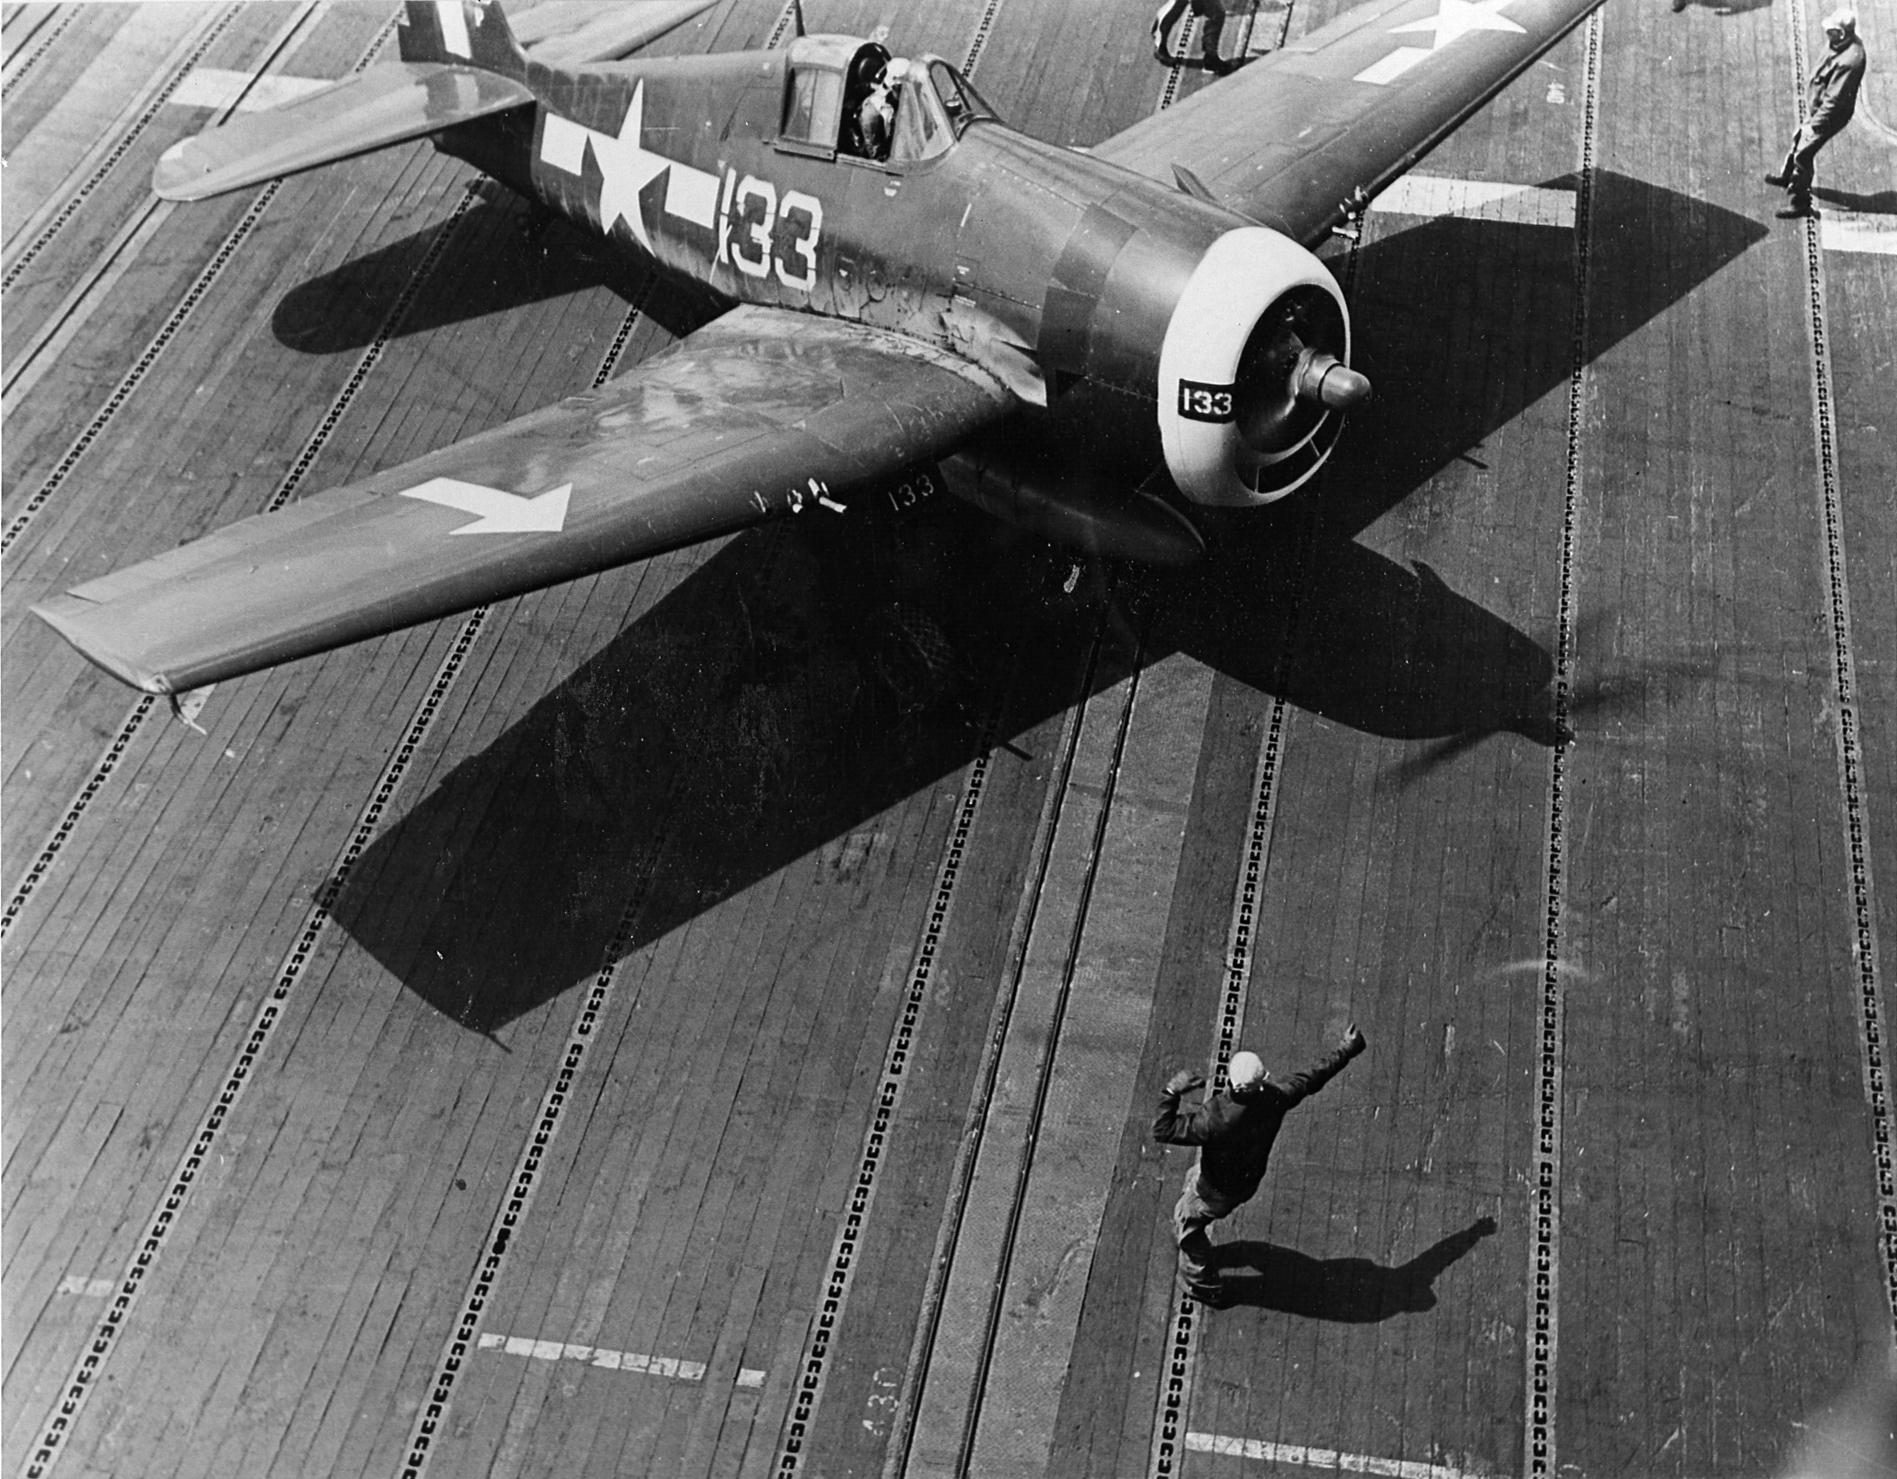 Grumman F6F 5P Hellcats VF 84 White 133 preparing to launch CV 17 Bunker Hill Feb 1945 01